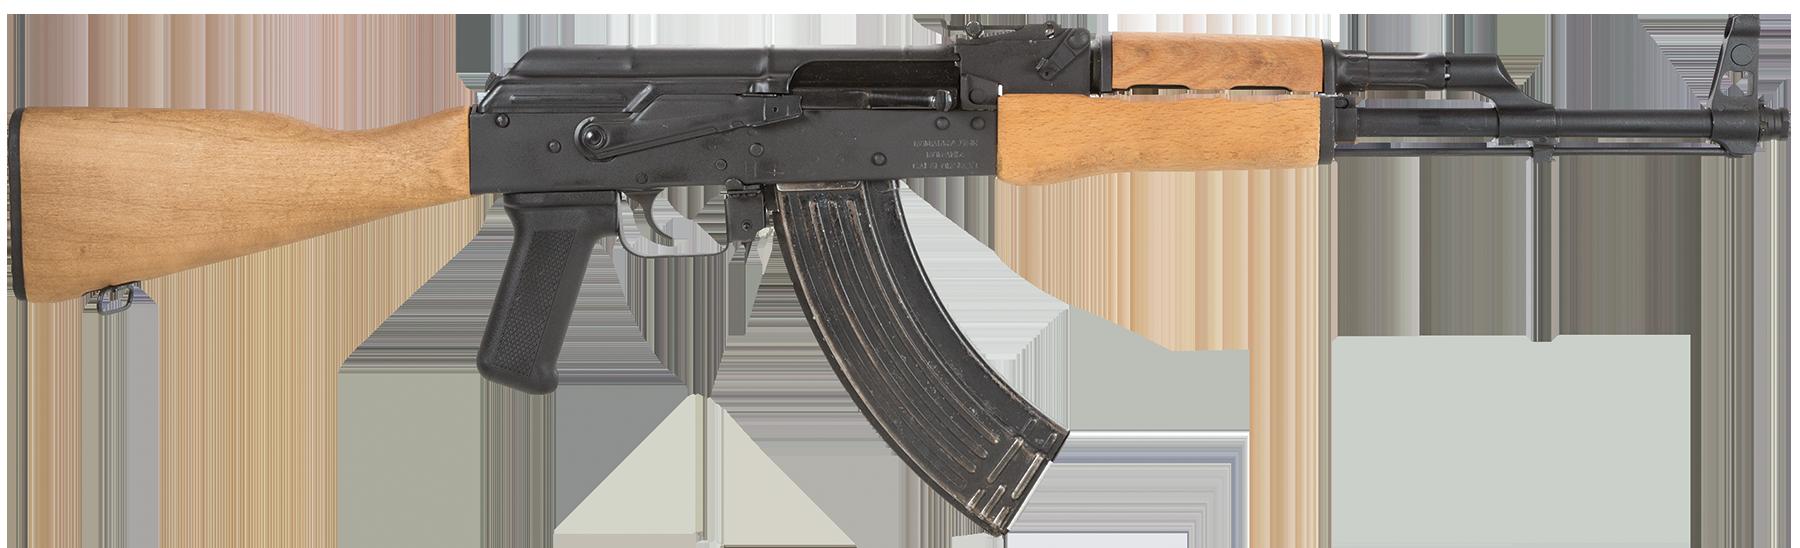 Wooden AK-47 PNG Image